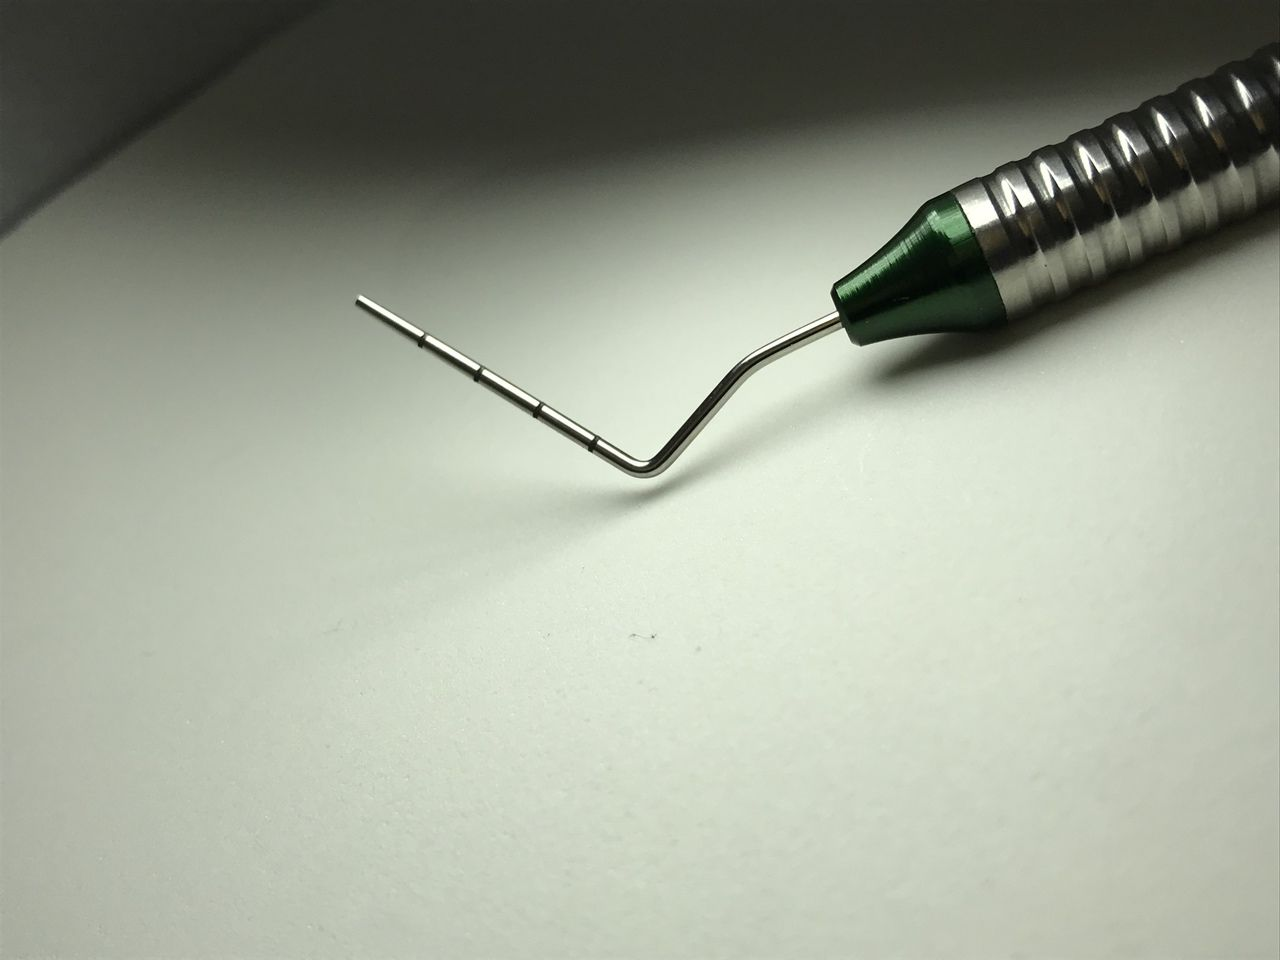 CONDENSADOR SCHILDER SIMPLES - ENDOPRIME